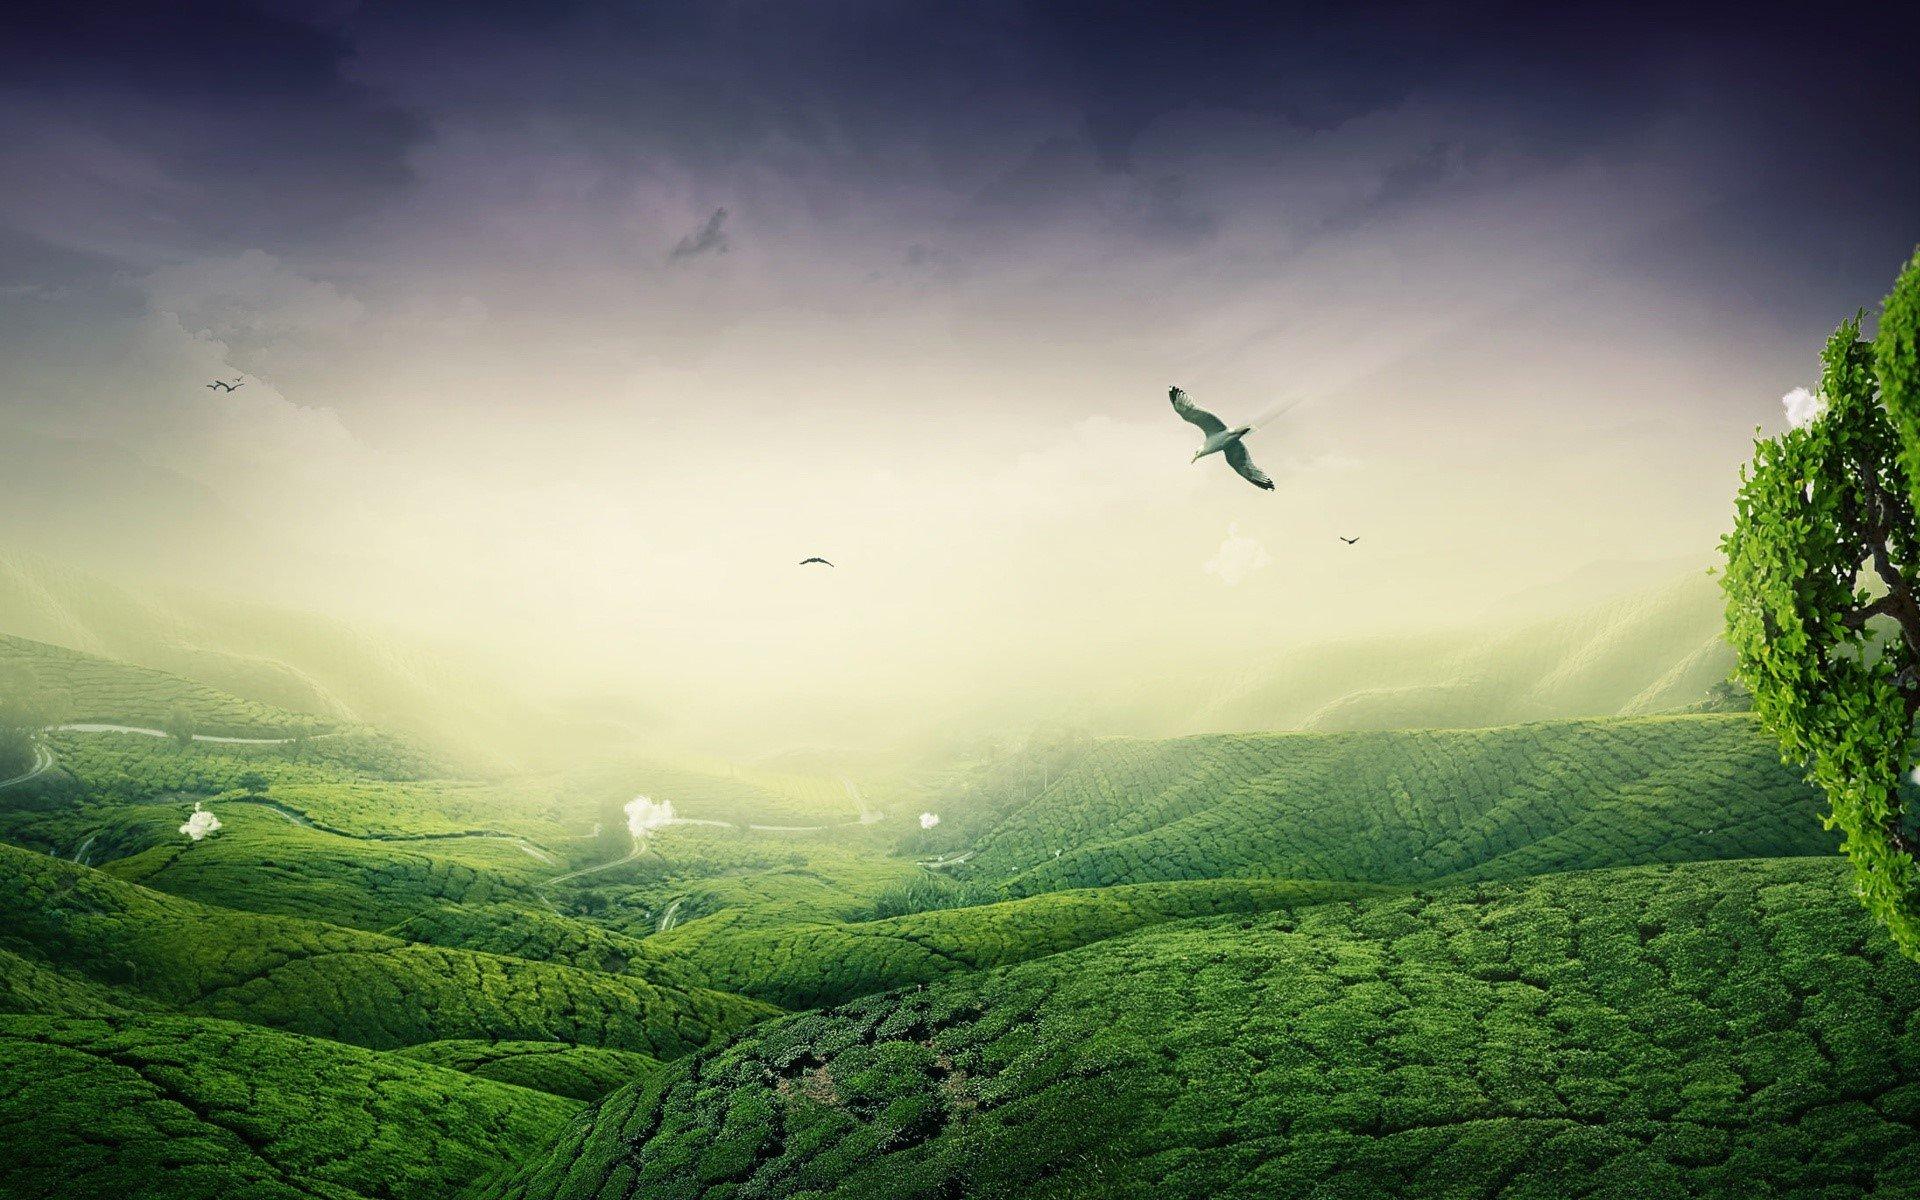 Wallpaper Paisaje verde Images